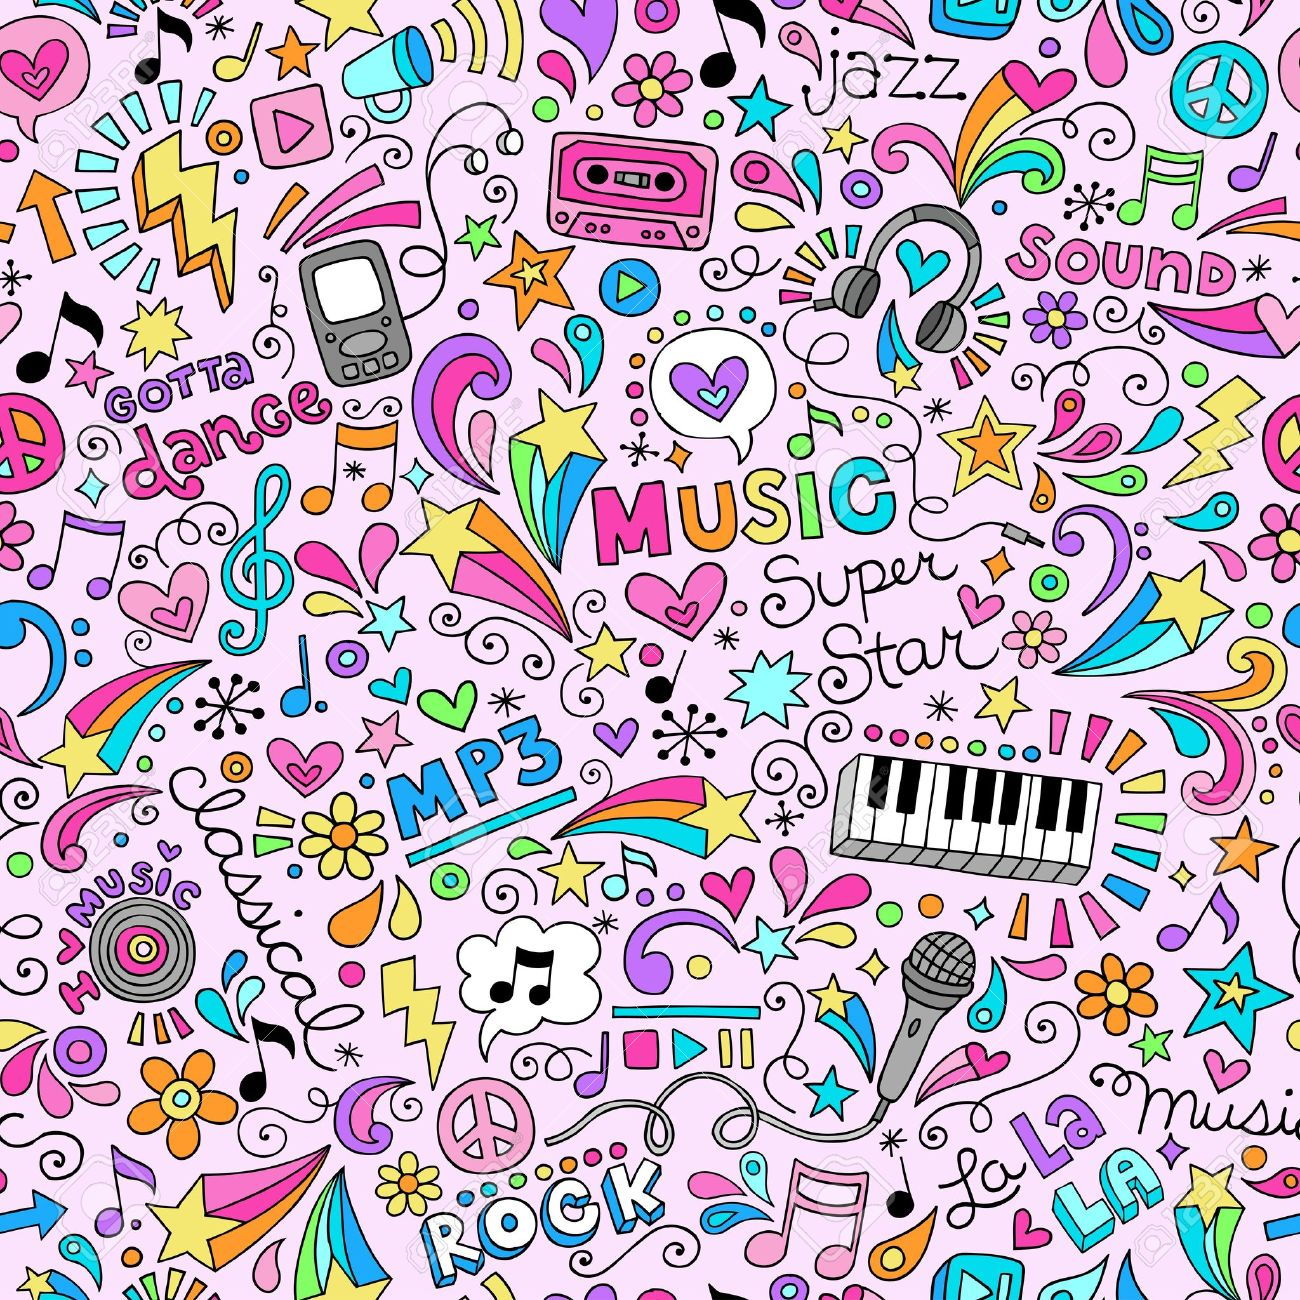 Music Groovy Doodles Illustration Hand-Drawn Design Elements Stock Vector - 17165015